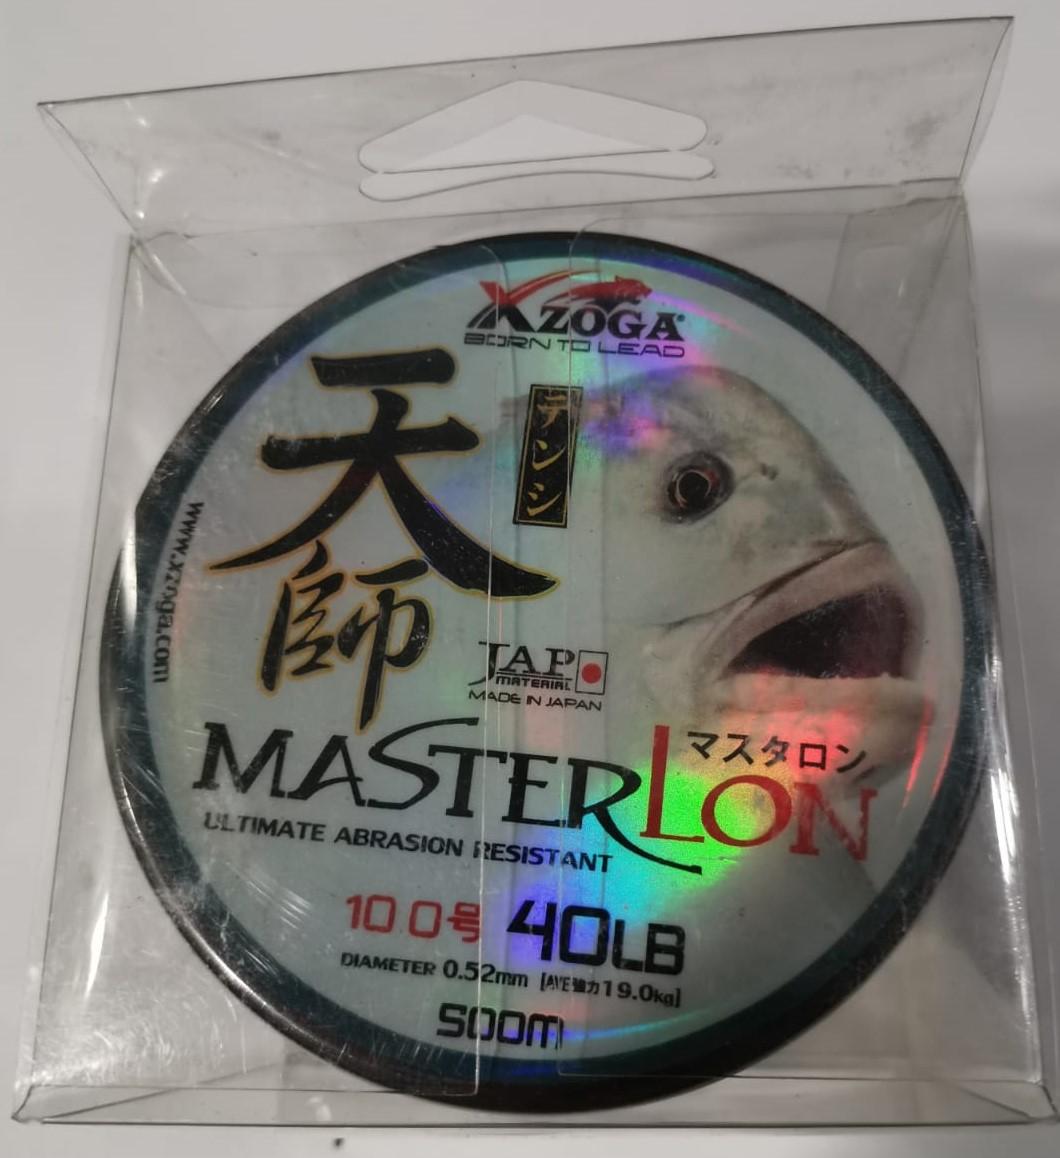 Xzoga Masterlon 12lb//1500m Monofilament Fishing Line